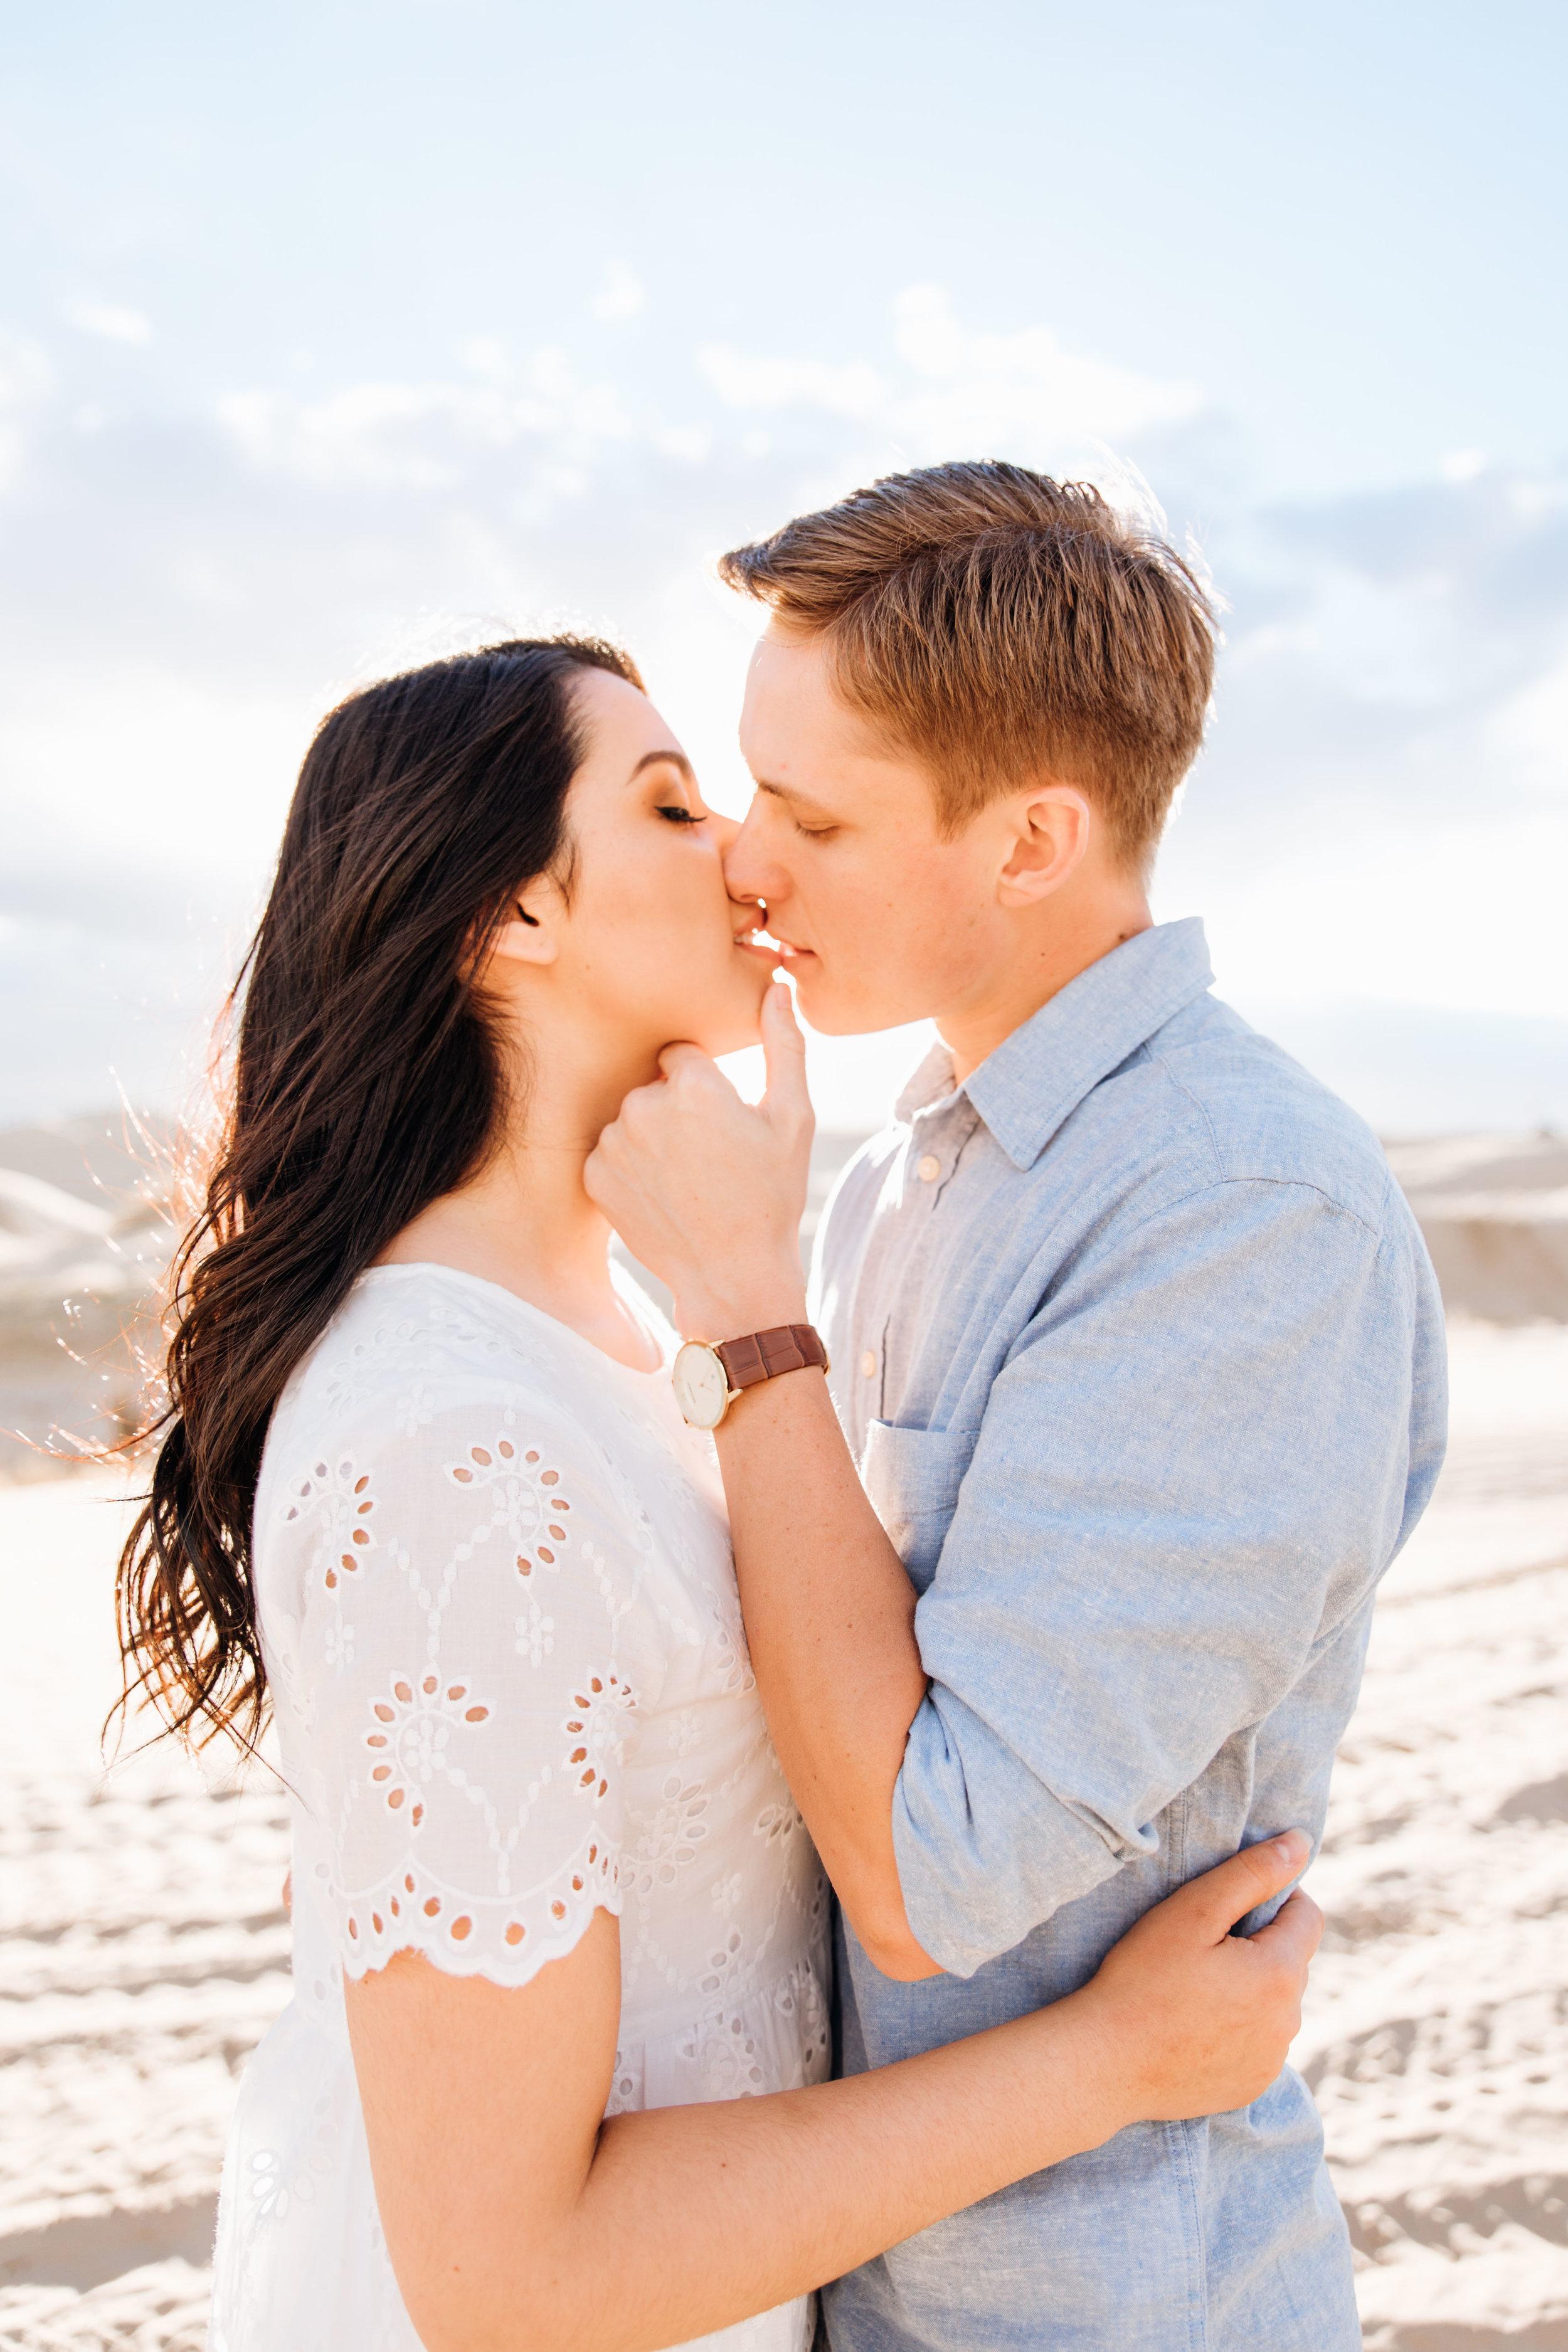 little-sahara-recreation-area-elopement-engagement-wedding-photography-michael-cozzens-52.jpg